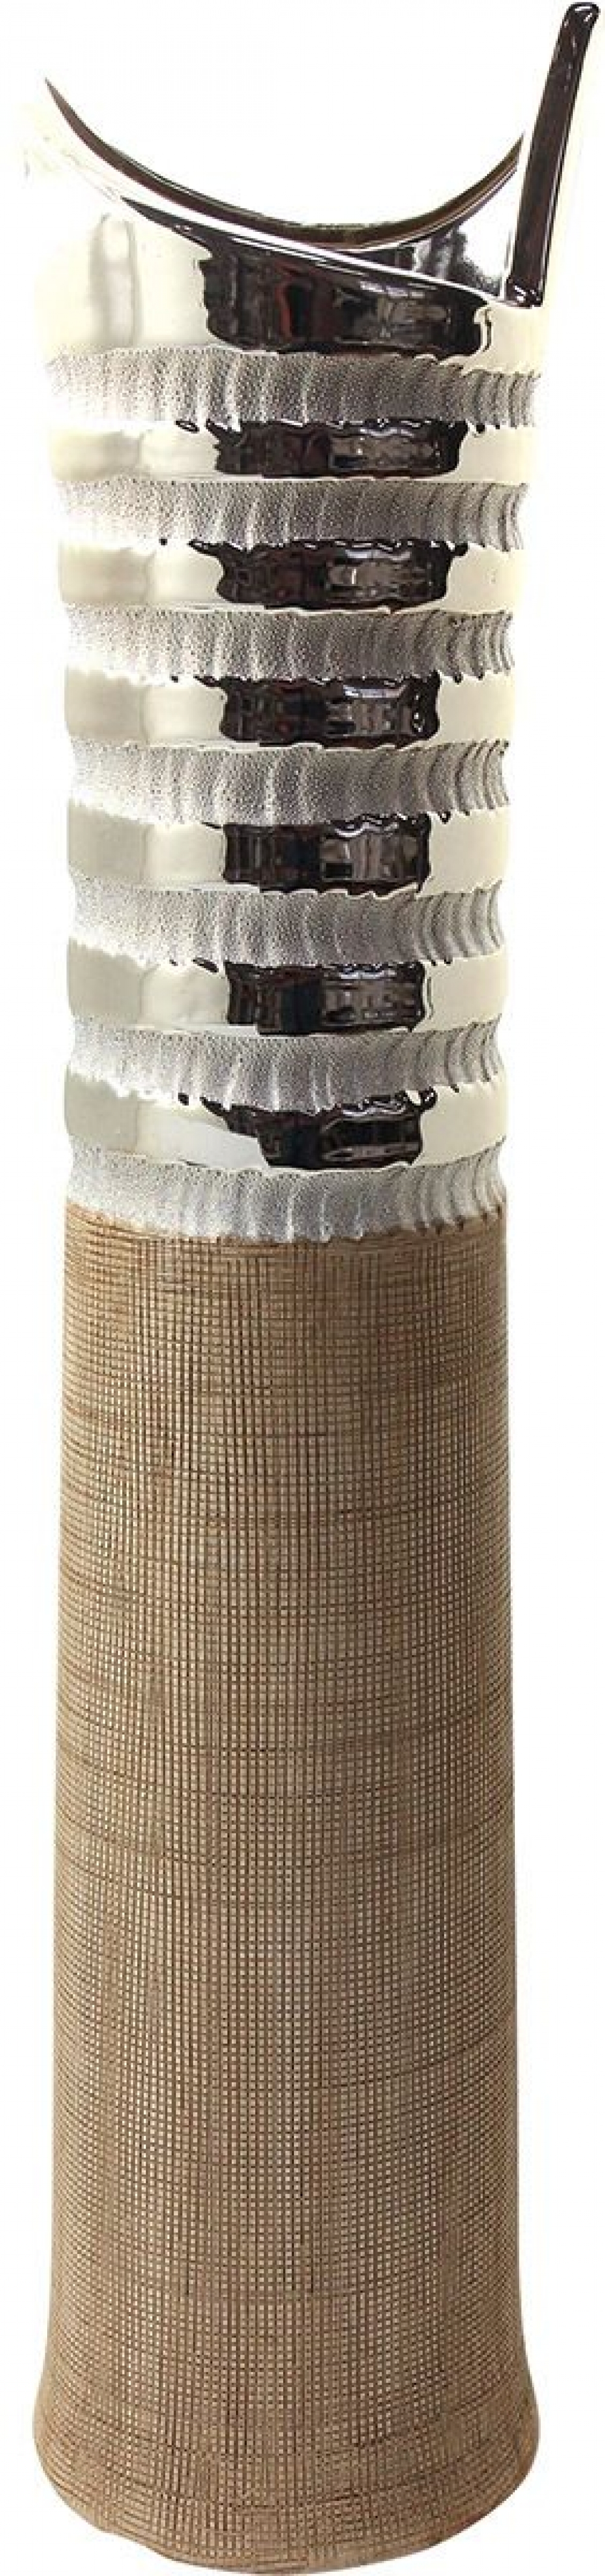 Vaza de podea din ceramica Newtown H81cm imagine 2021 insignis.ro